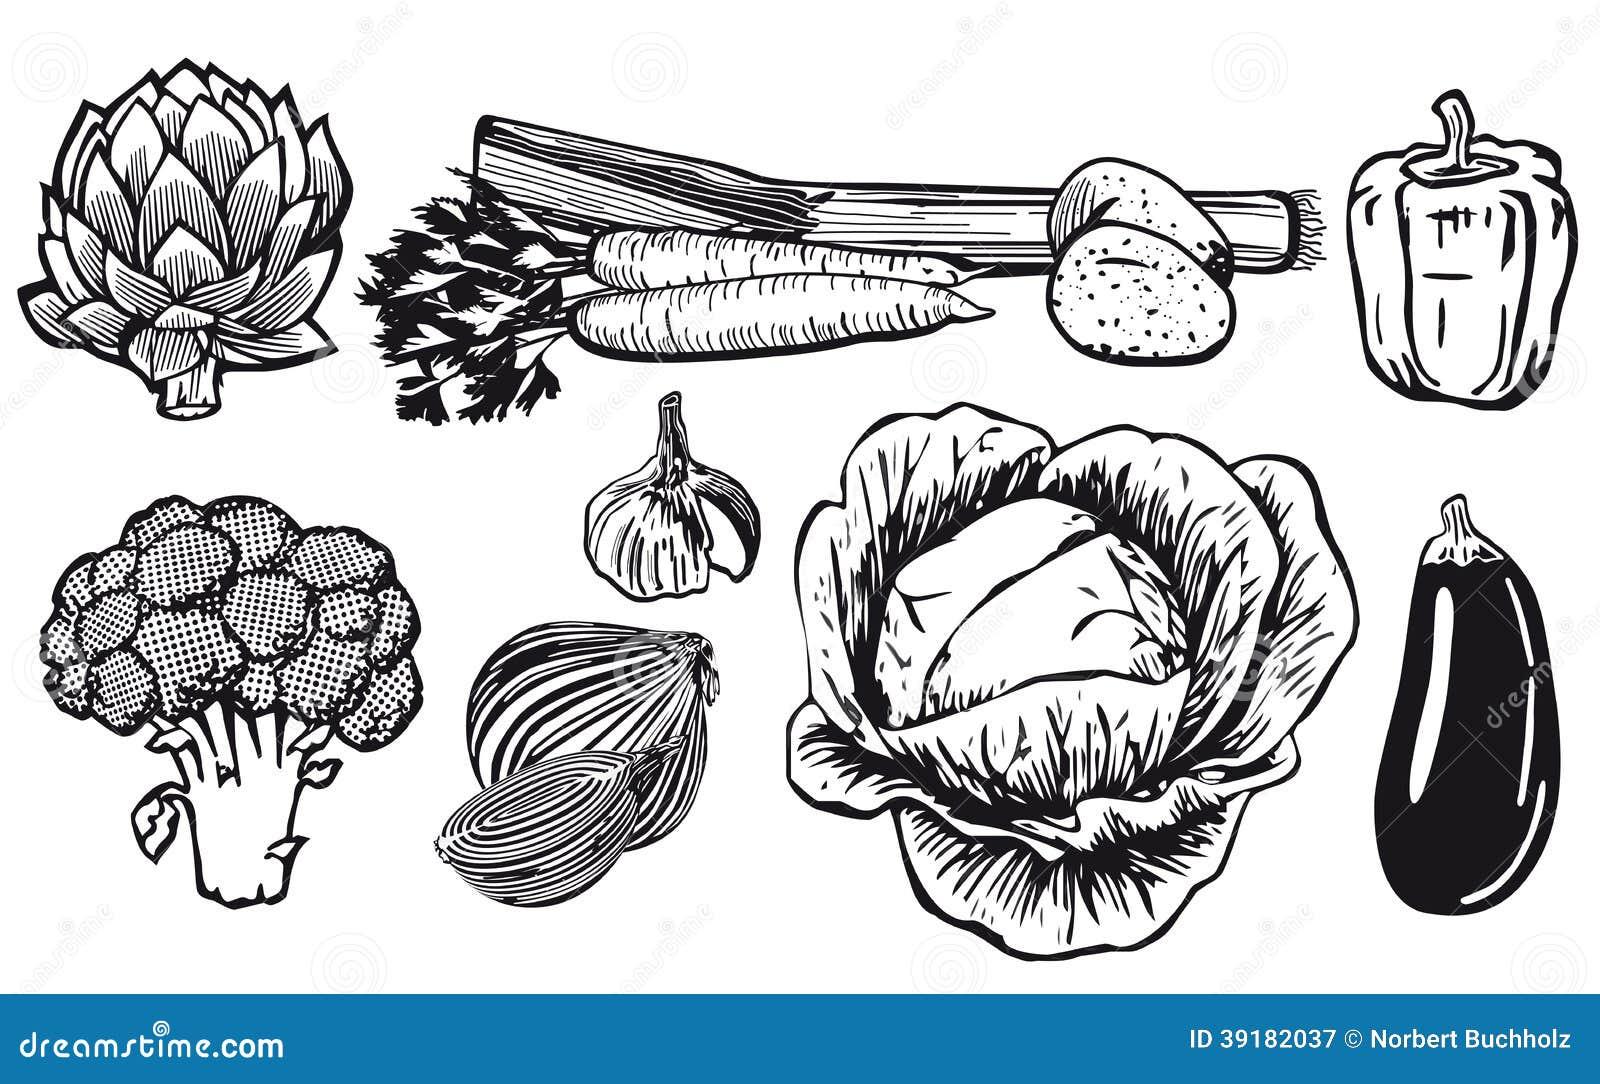 Line Art Vegetables : Line drawing of assorted vegetables stock vector image